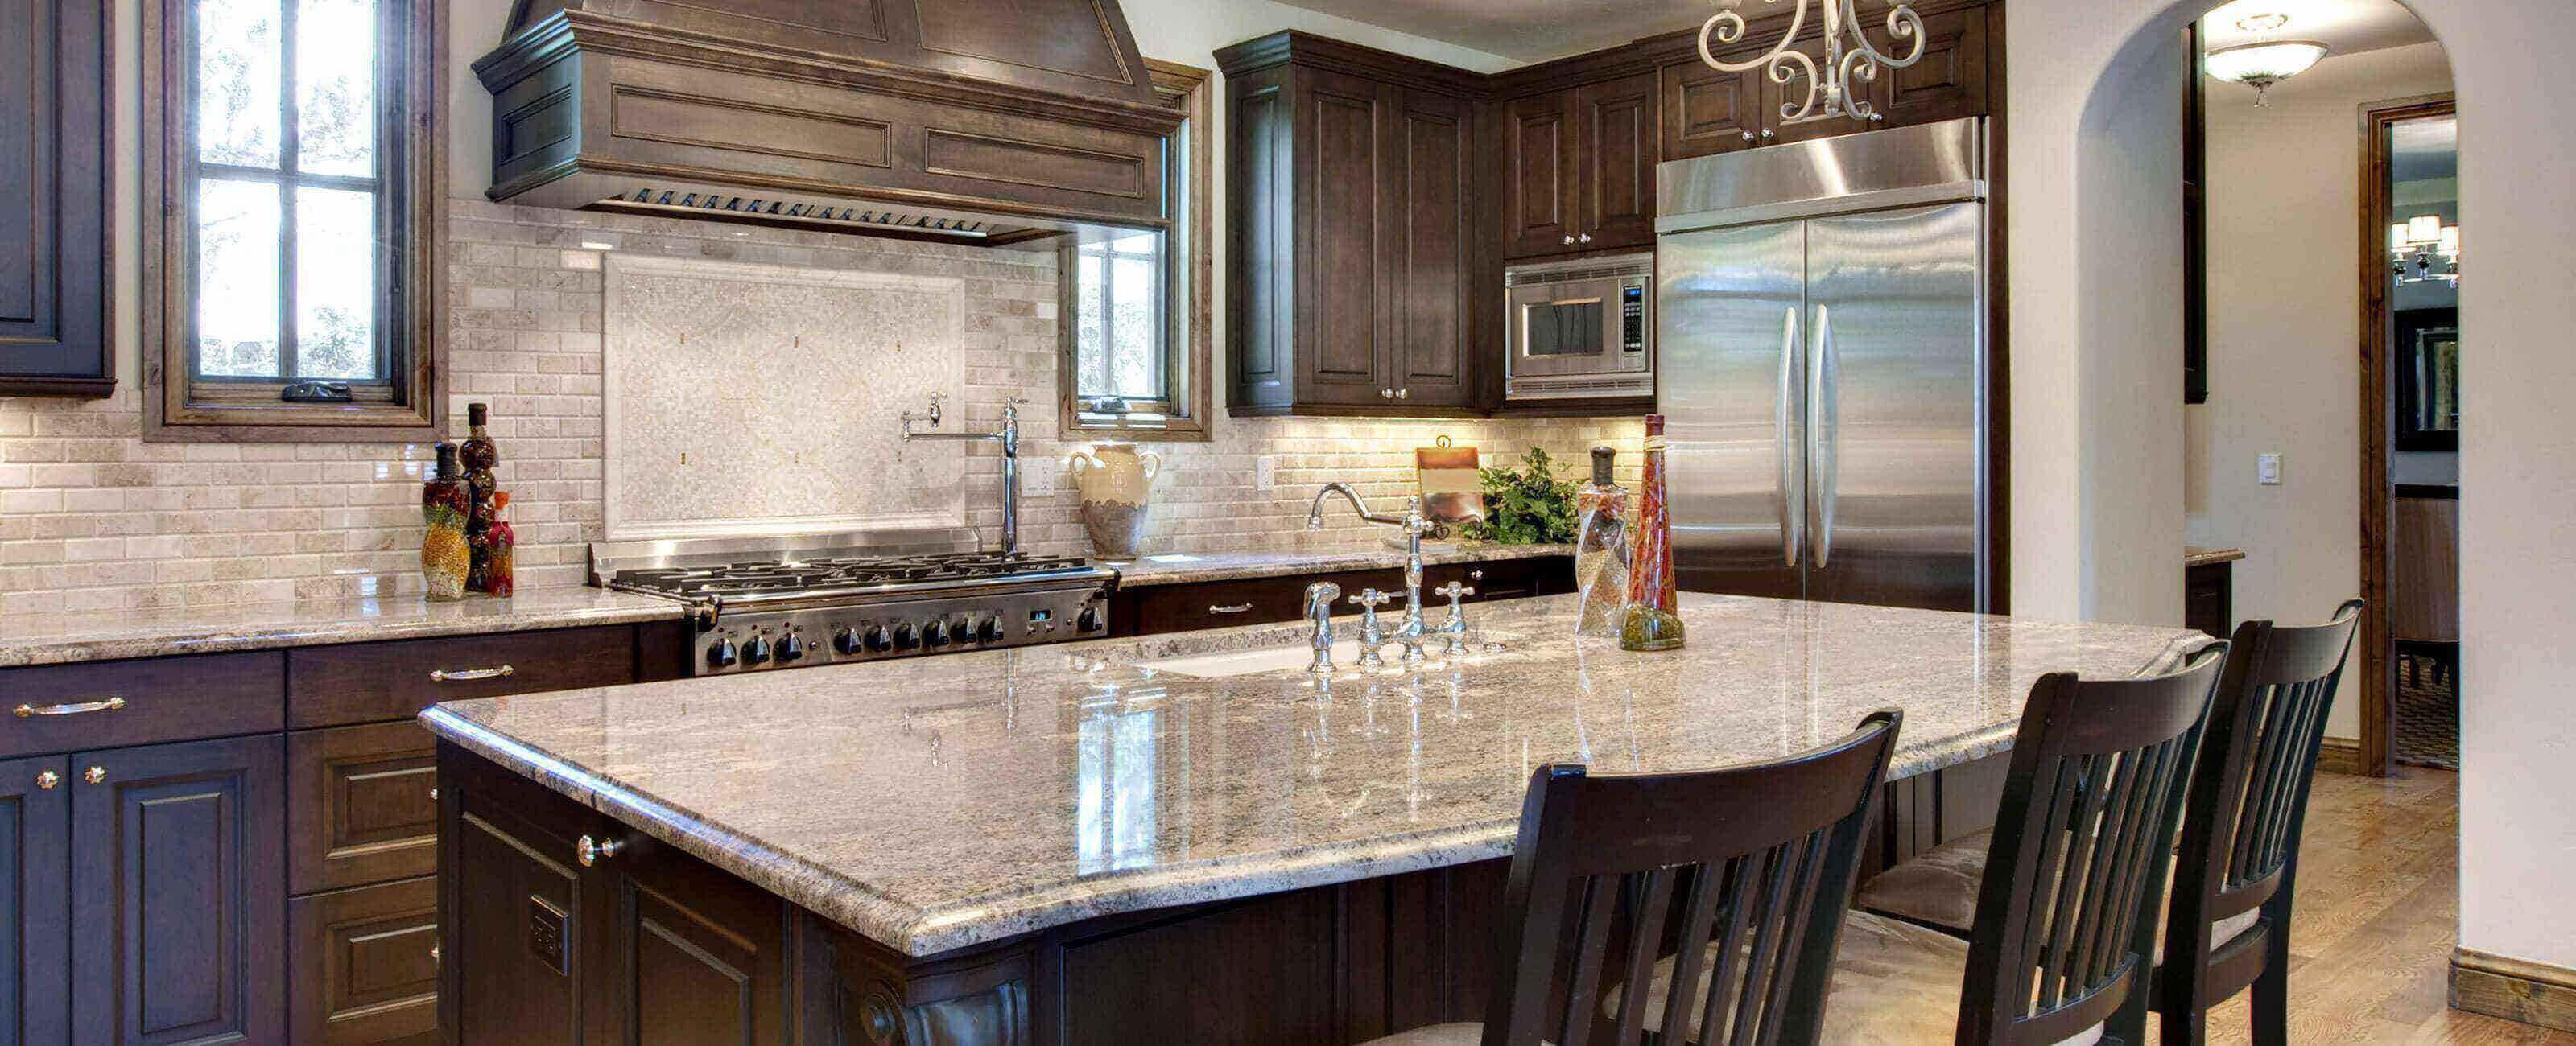 Michigan Granite Countertops - Great Lakes Granite & Marble on Black Granite Countertops With Brown Cabinets  id=33173